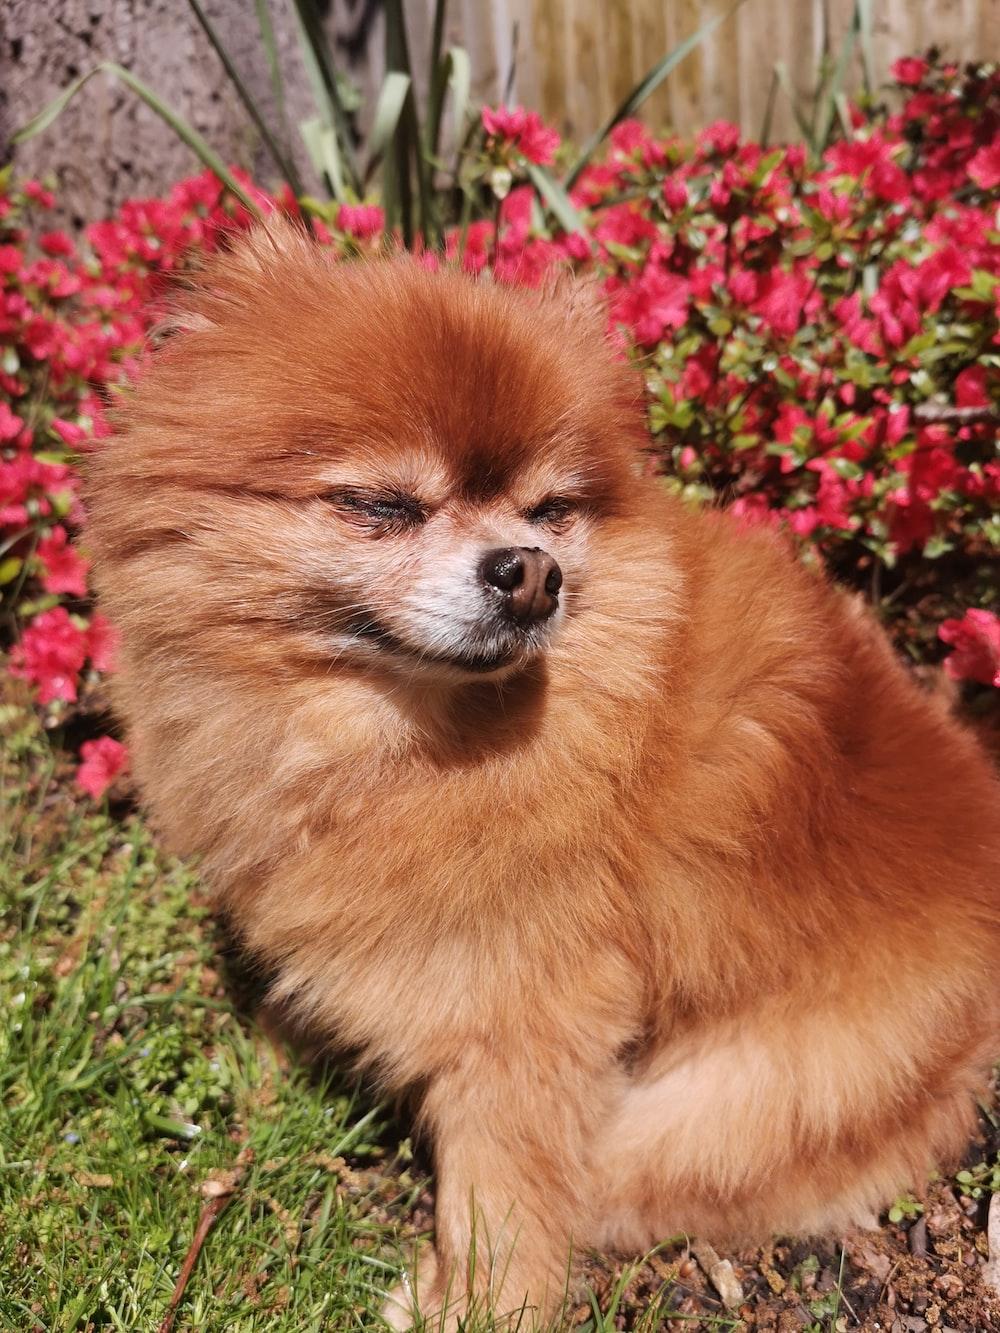 red Pomeranian dog near red flowers